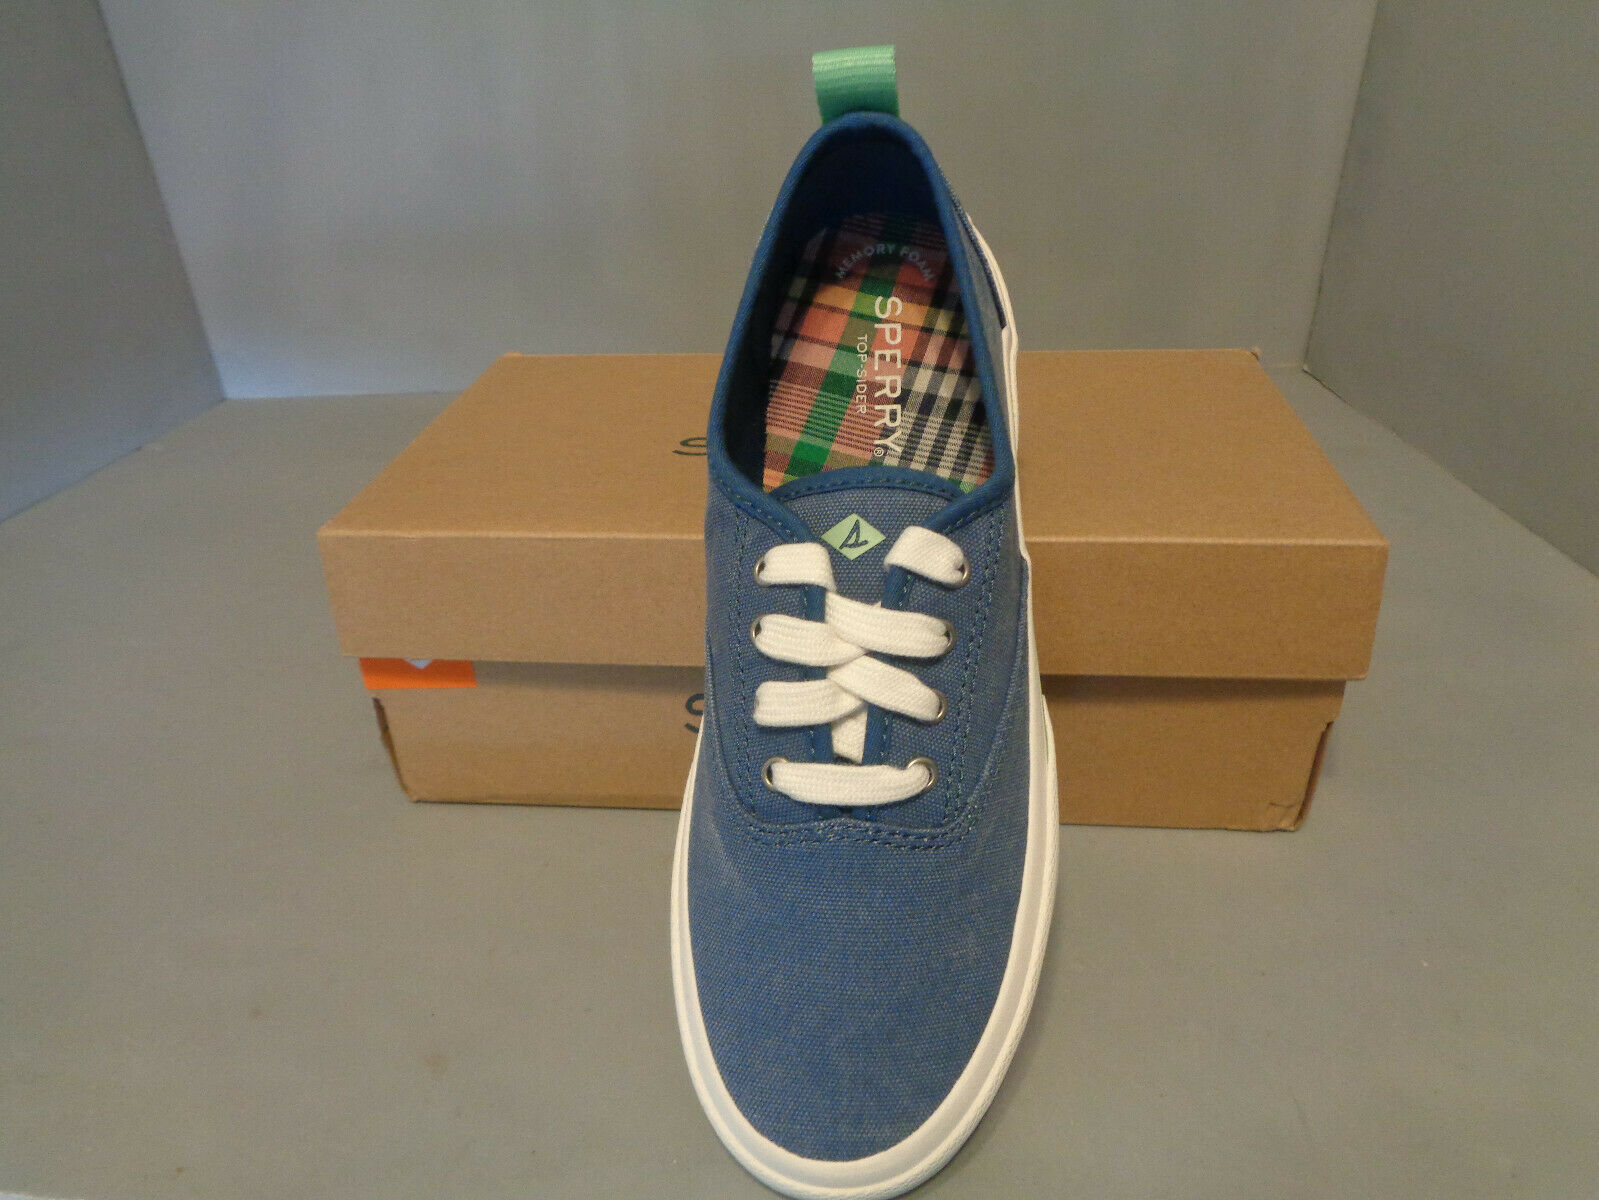 Women's Sperry Pier Wave CVO Sneaker Shoes Blue Denim NIB* New Sizes Think Boat